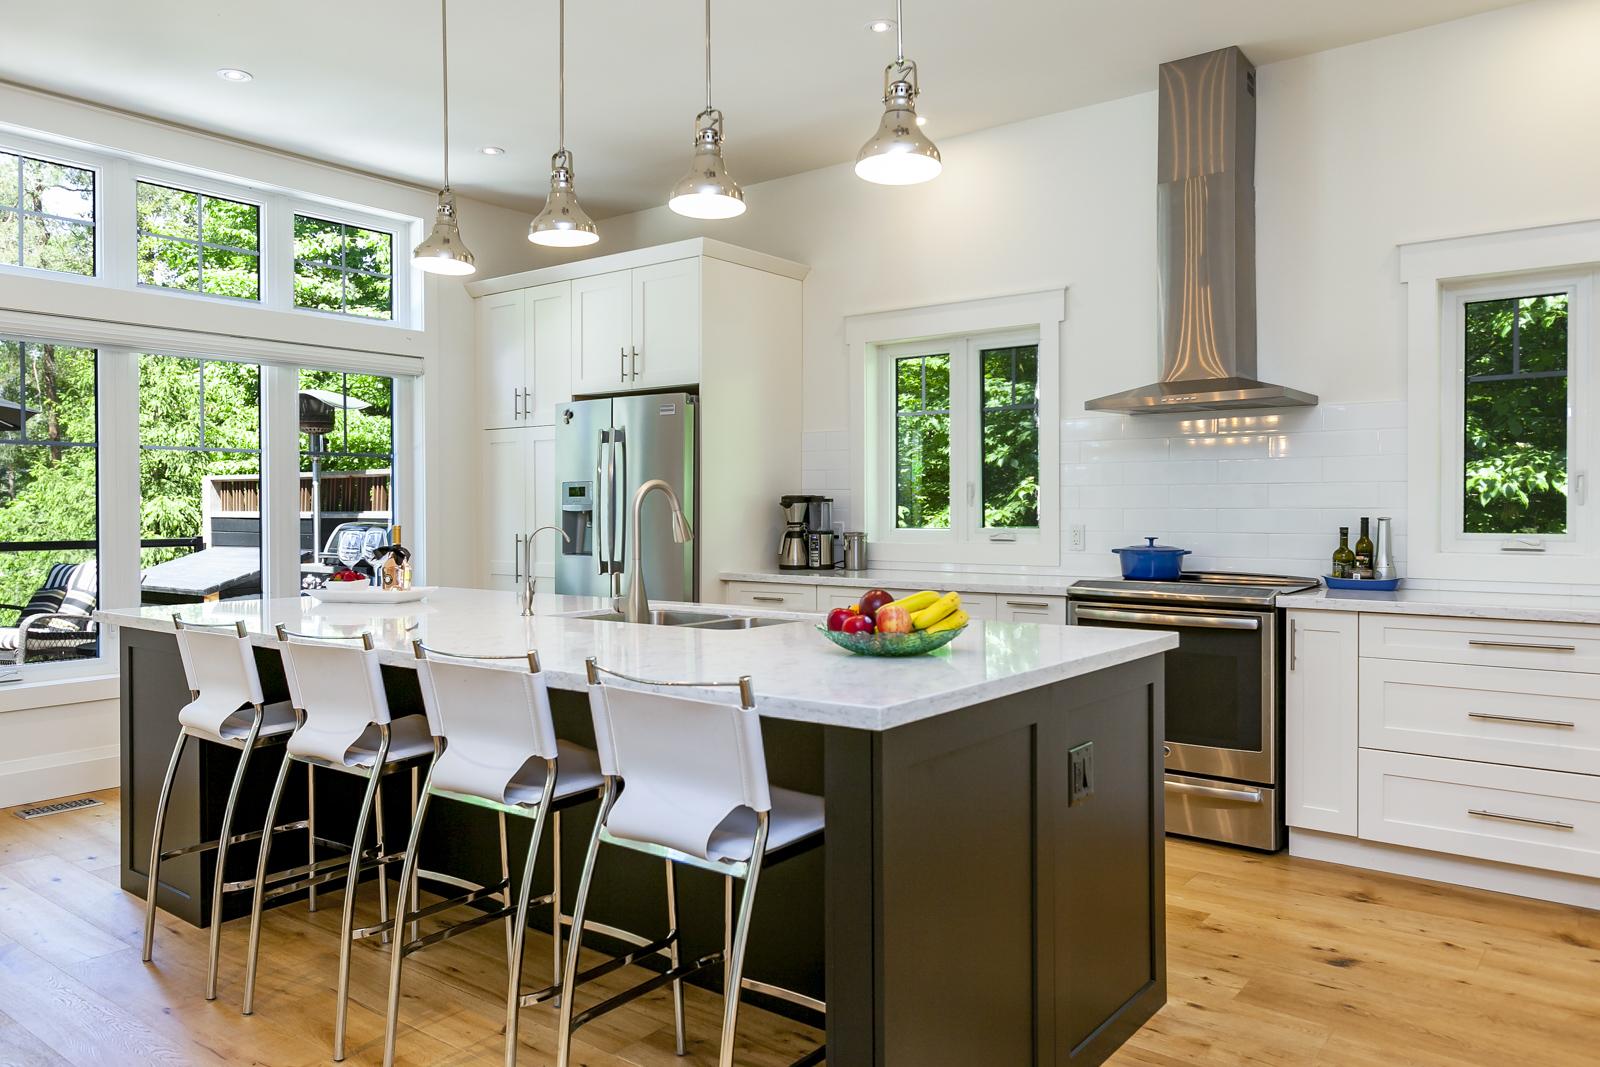 Bright, refreshing Kitchen Photos